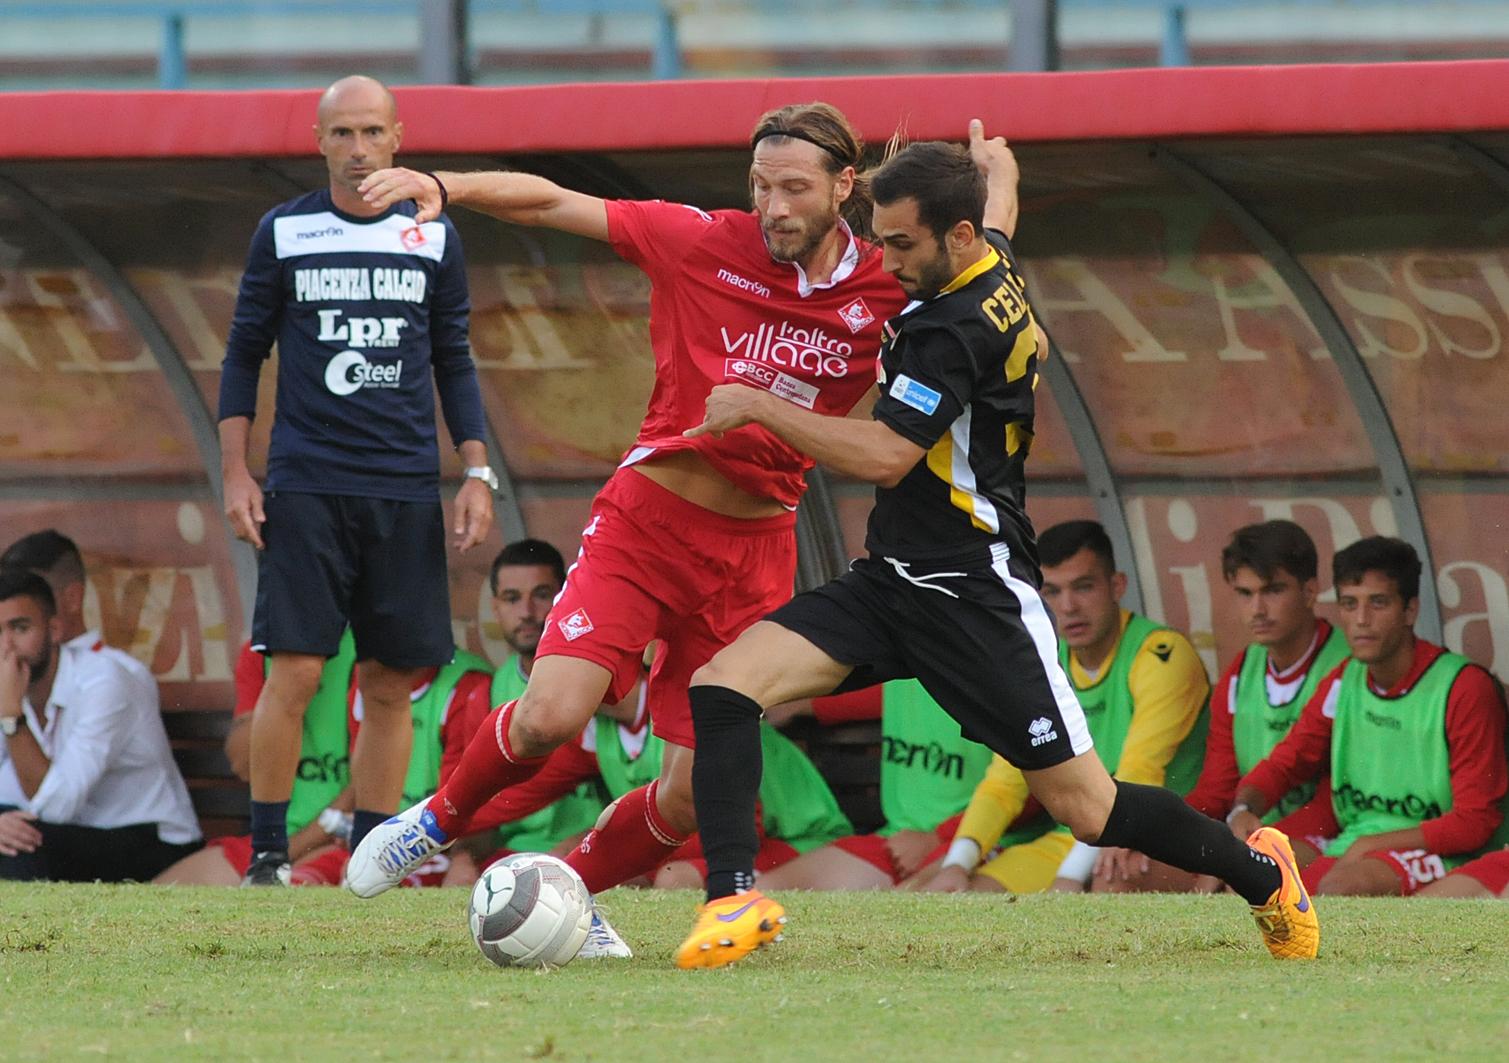 Piacenza Calcio Viterbese